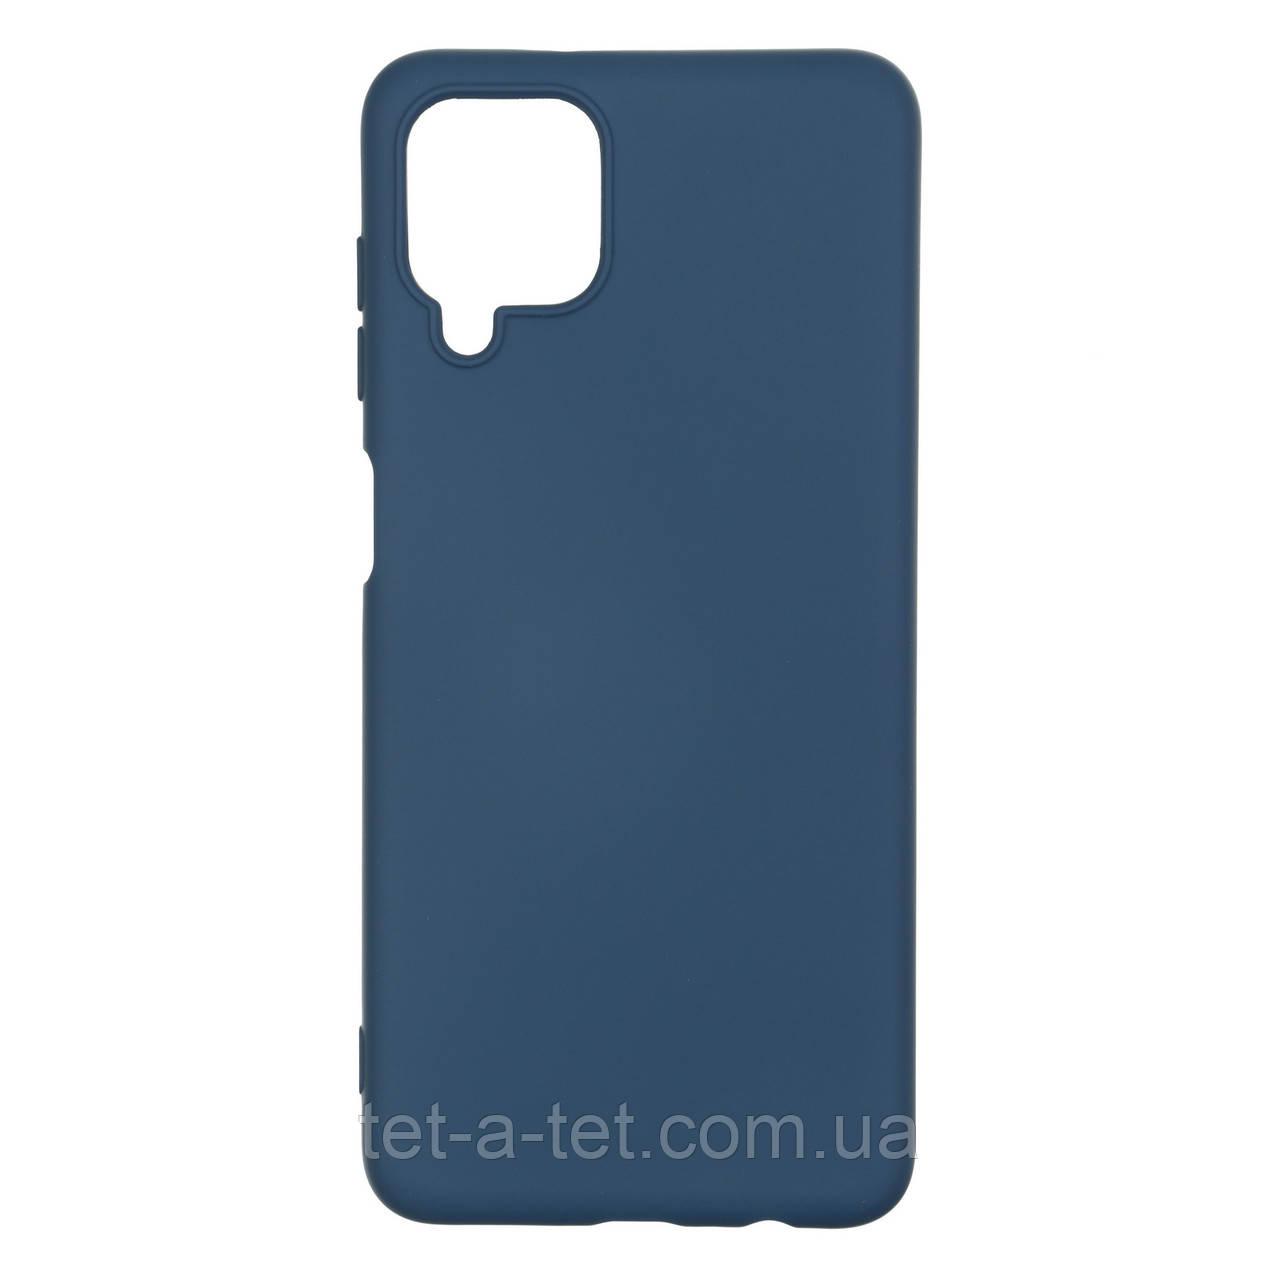 Чохол силіконовий ArmorStandart ICON Case for Samsung A12 (A125)/M12 (M125) Dark Blue